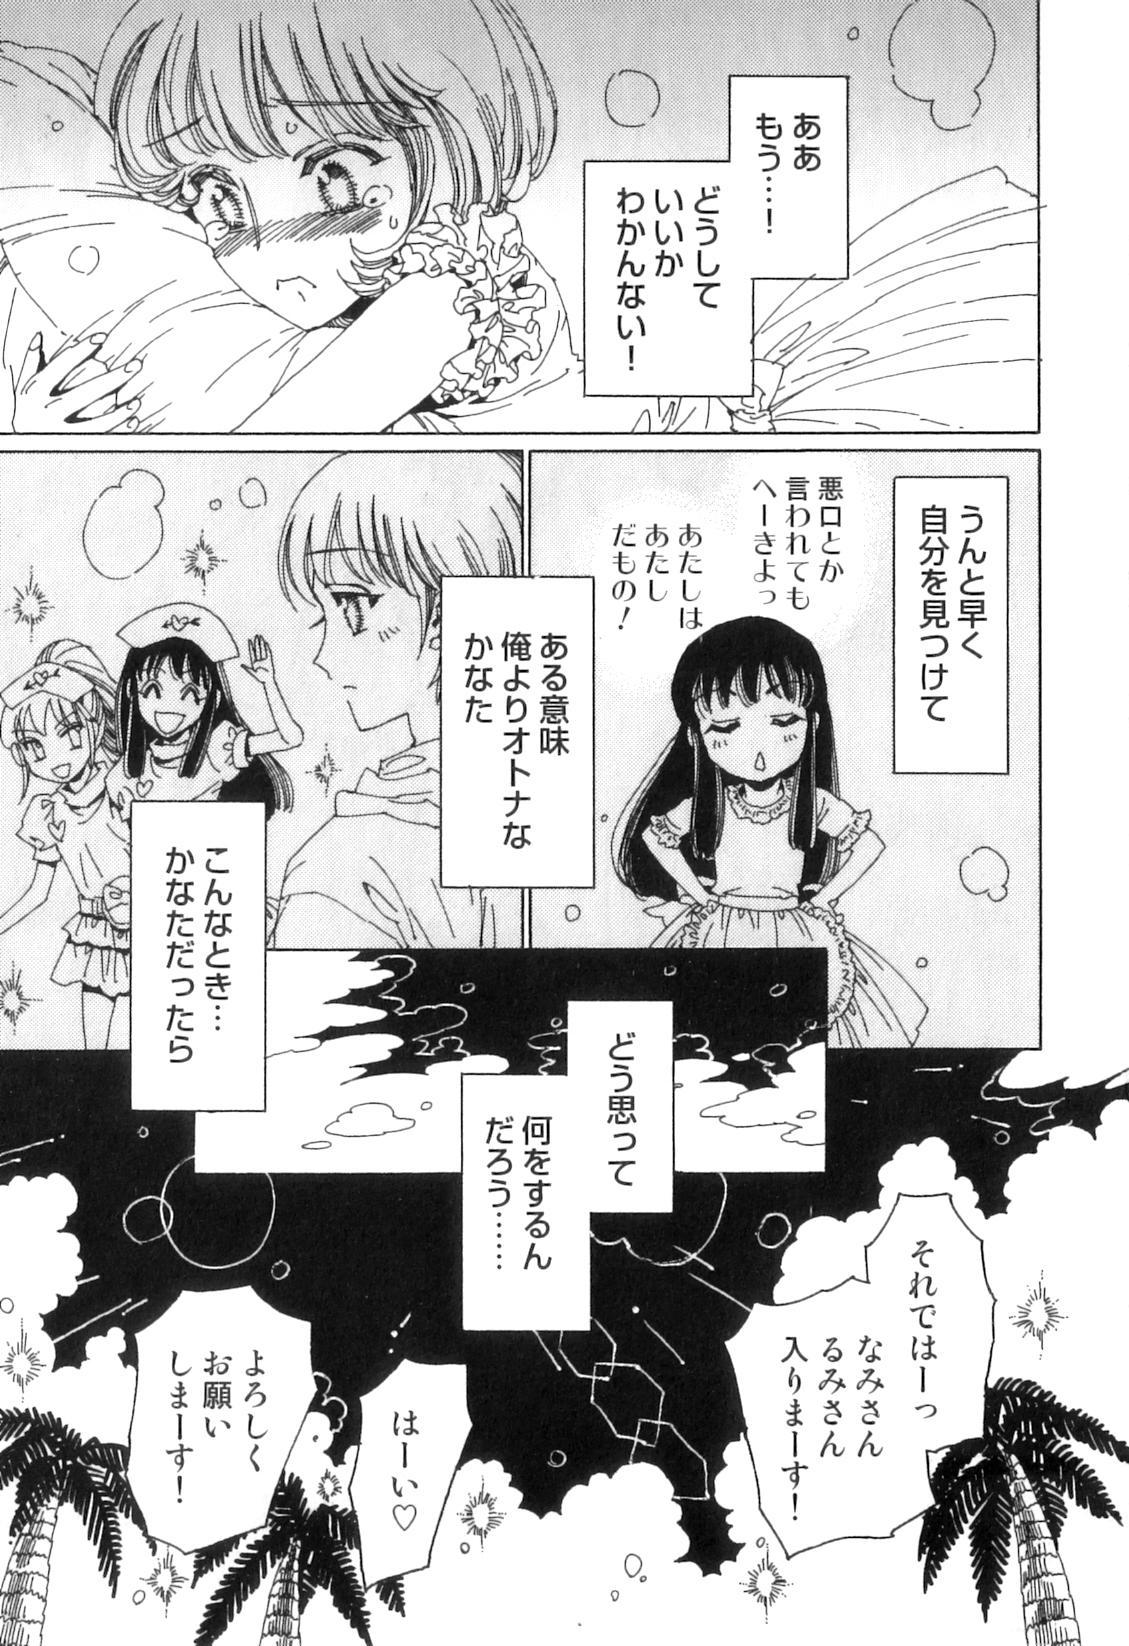 Yuni-Hapi 39